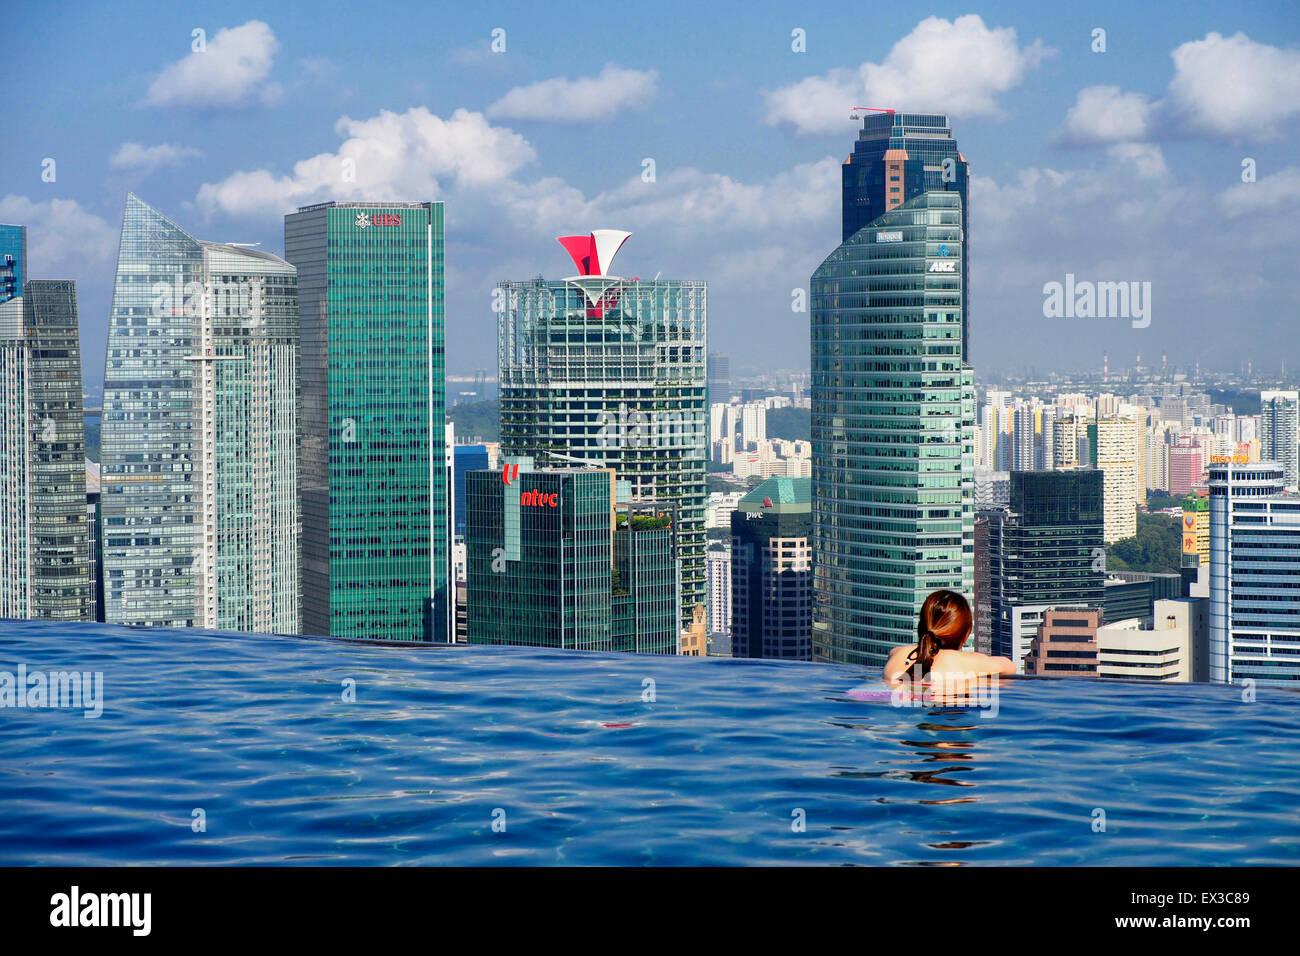 Woman at the mbs infinity pool and enjoying the singapore skyline stock photo royalty free - Singapur skyline pool ...